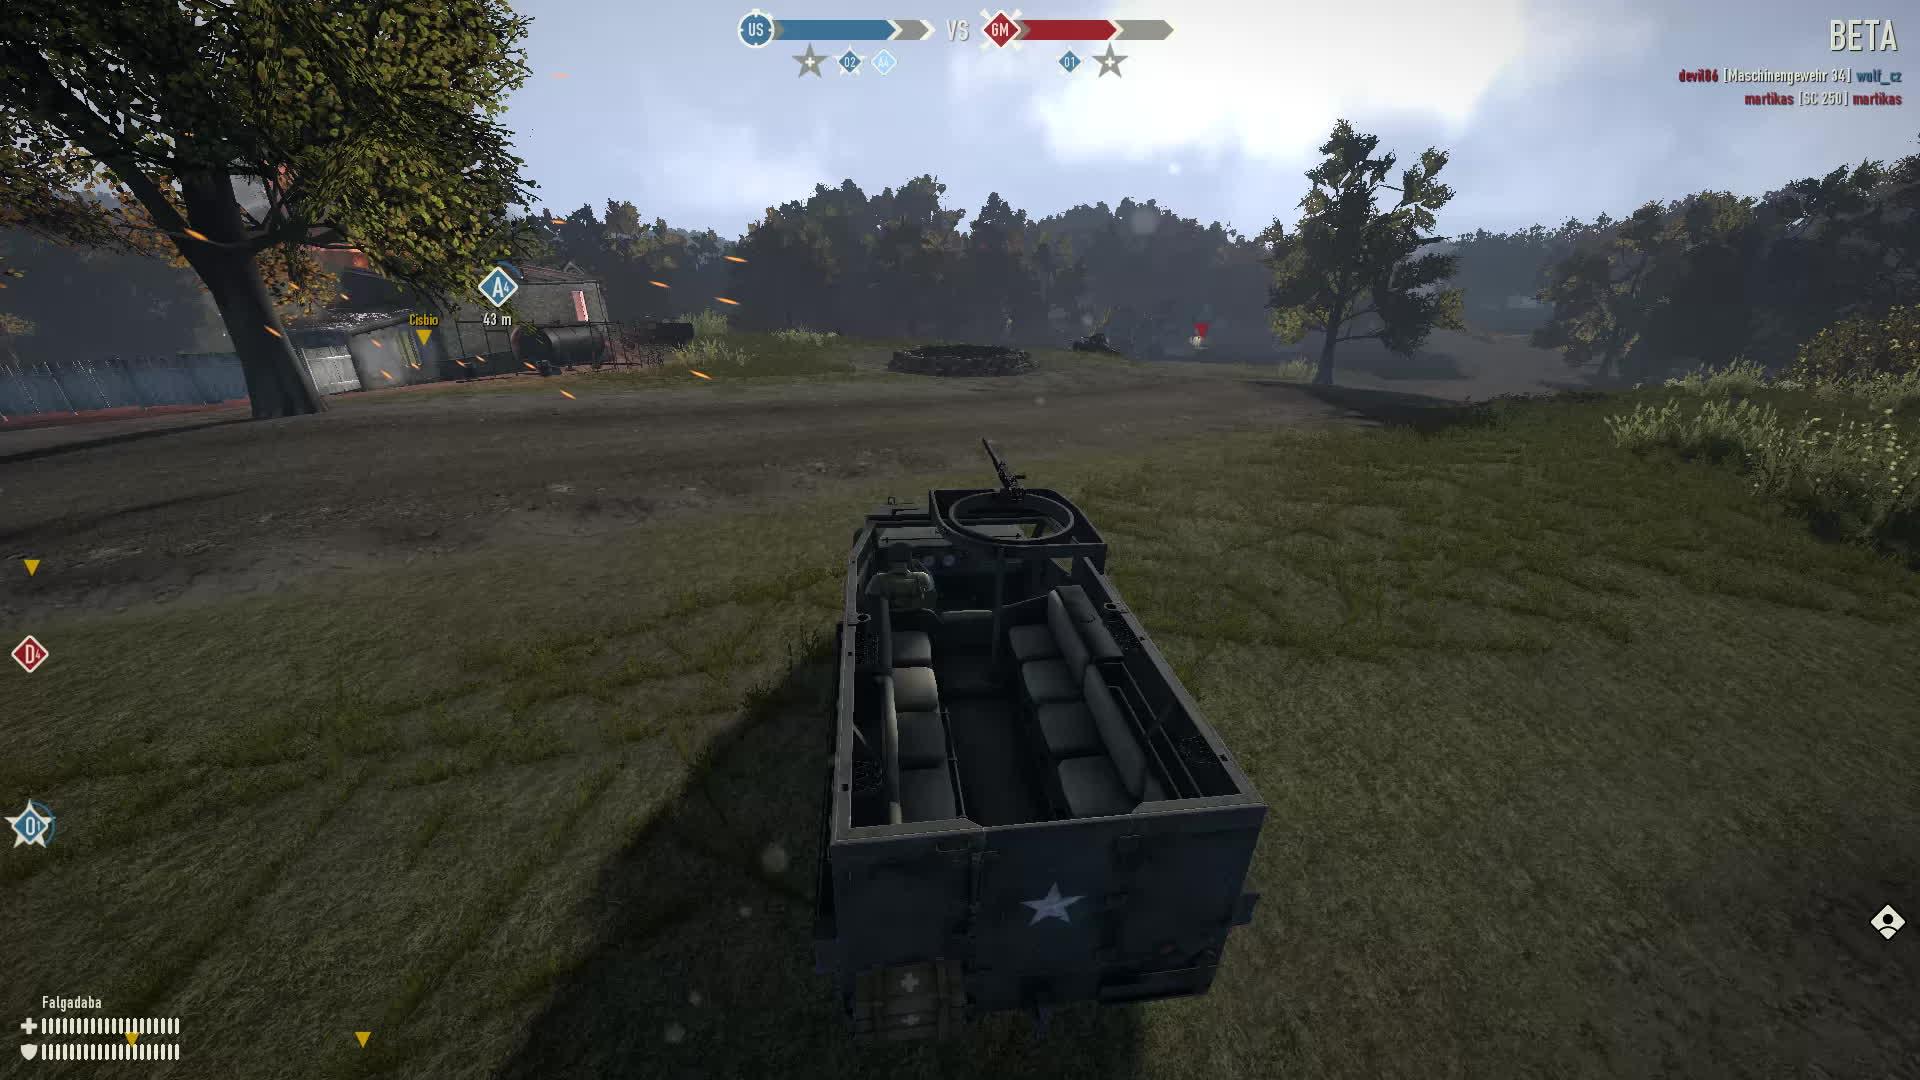 heroesandgenerals, APC versus very light tank GIFs